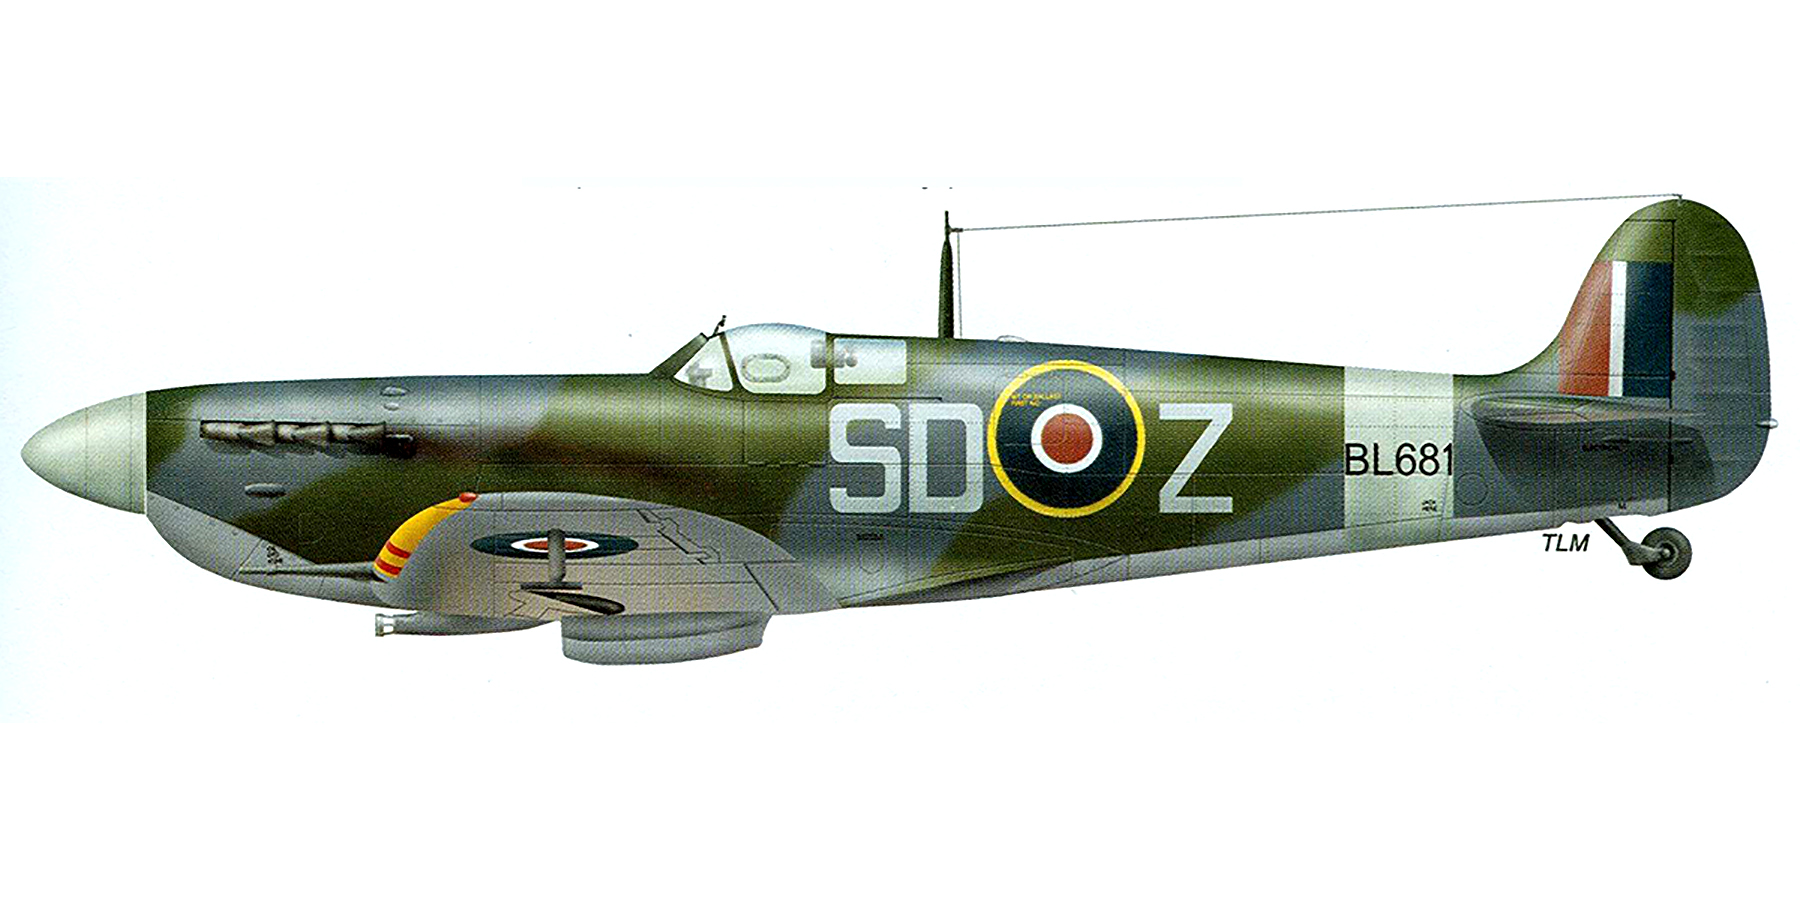 Spitfire MkVb RAF 501Sqn SDZ BL681 Dec 1943 0A